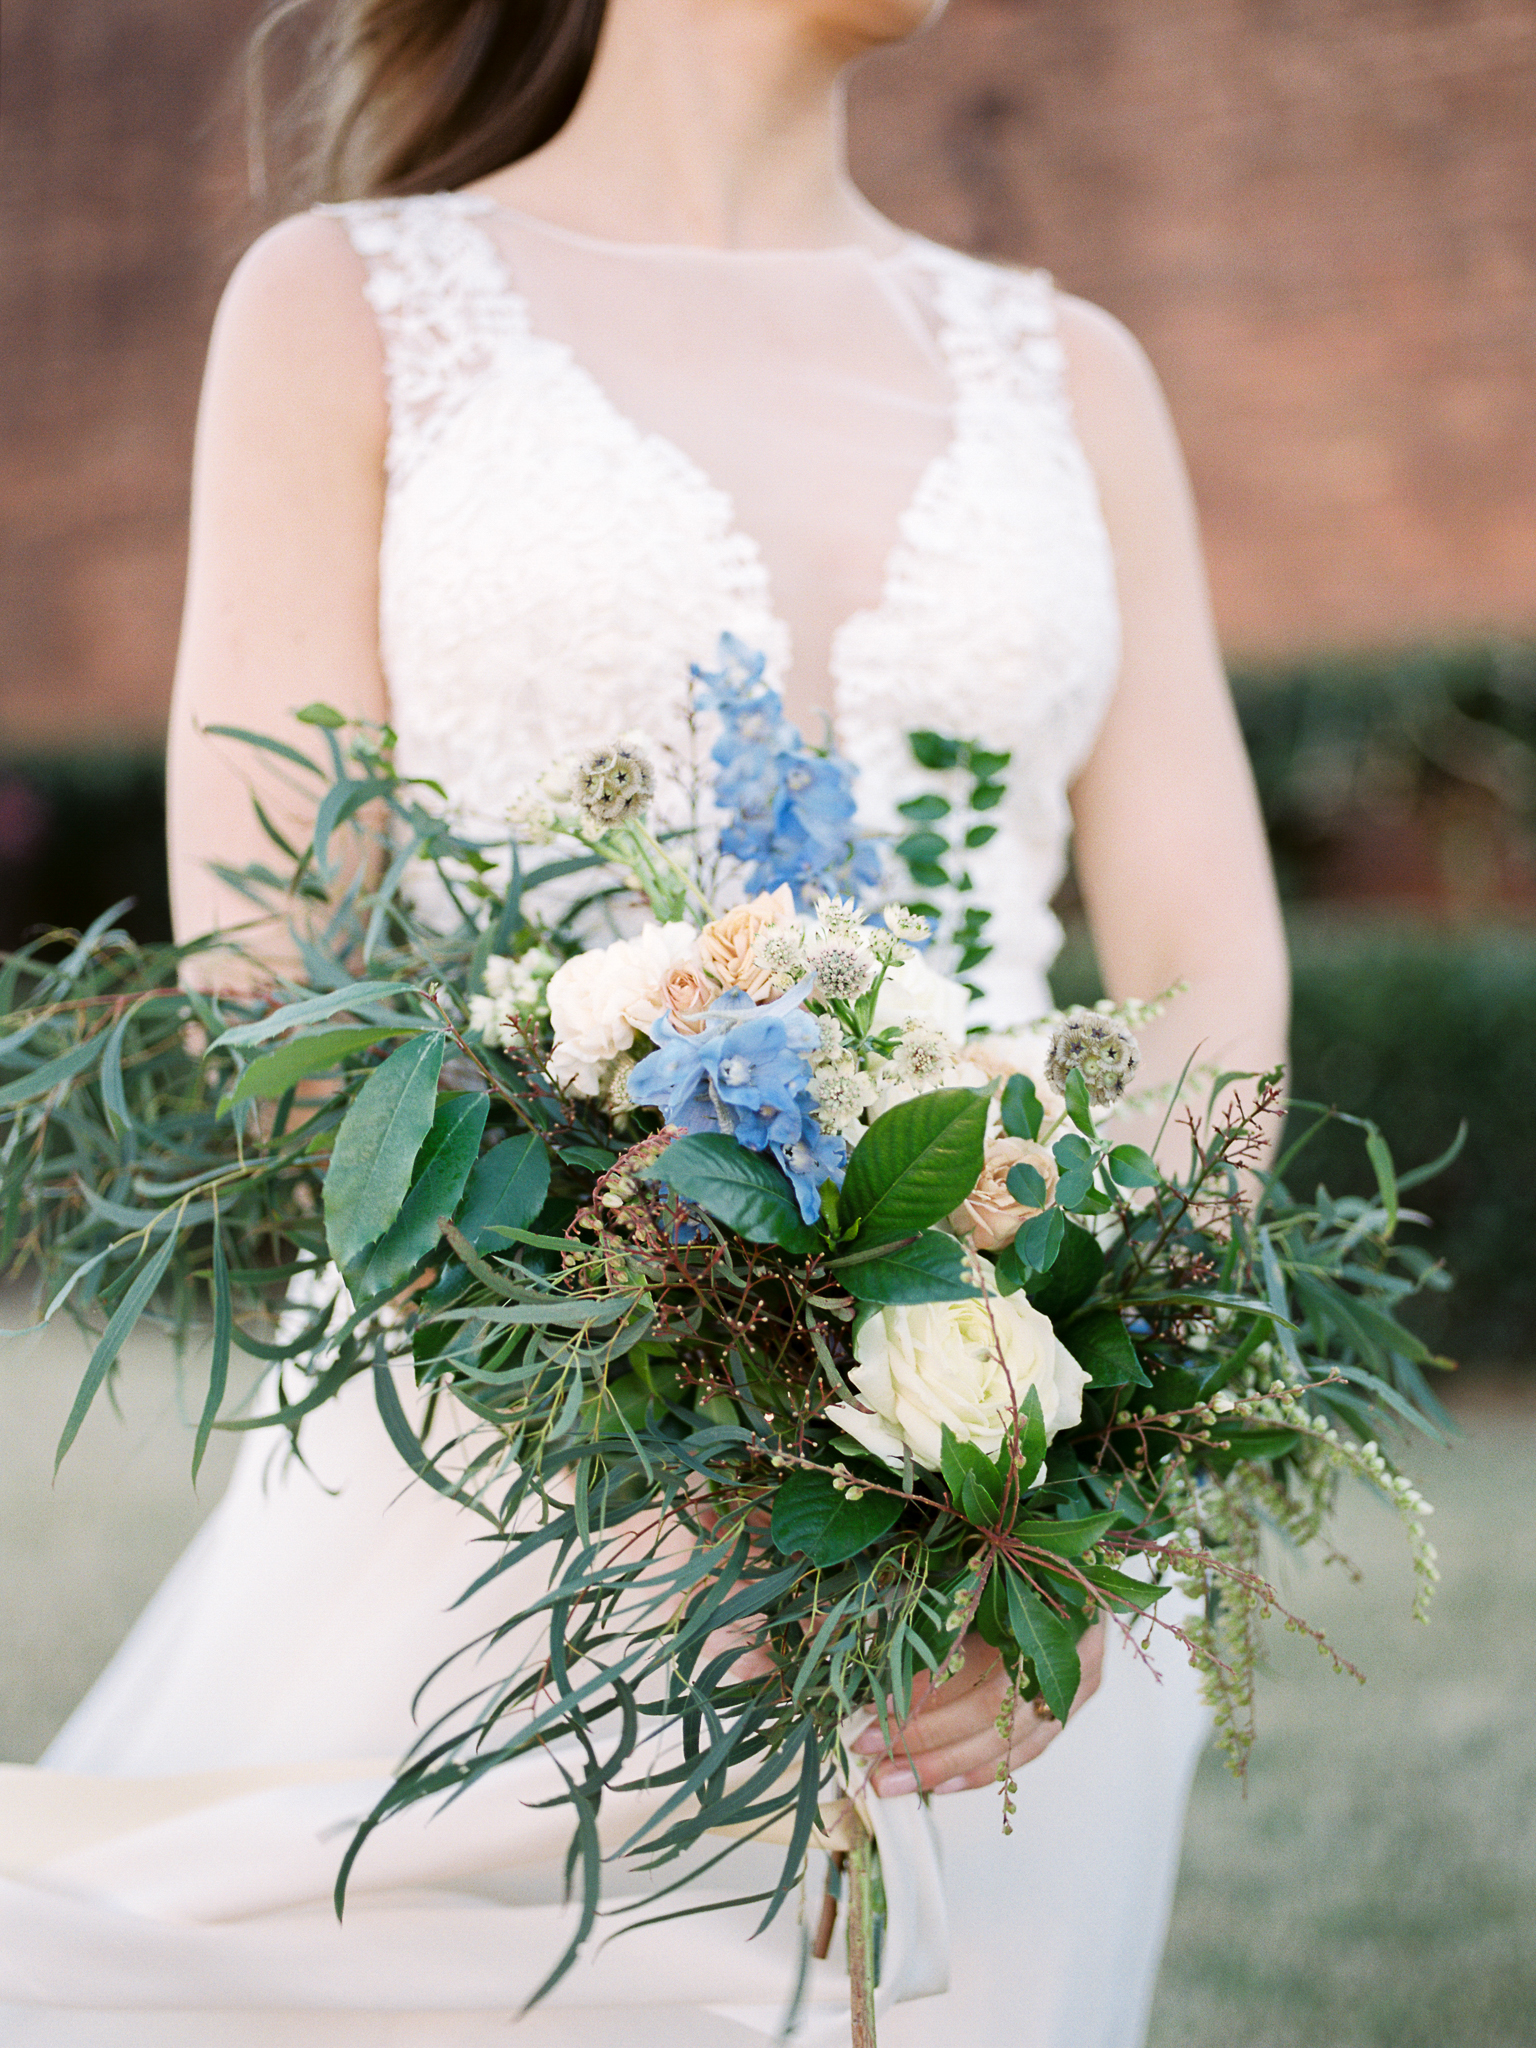 christinadavis+weddinginspiration44.jpg